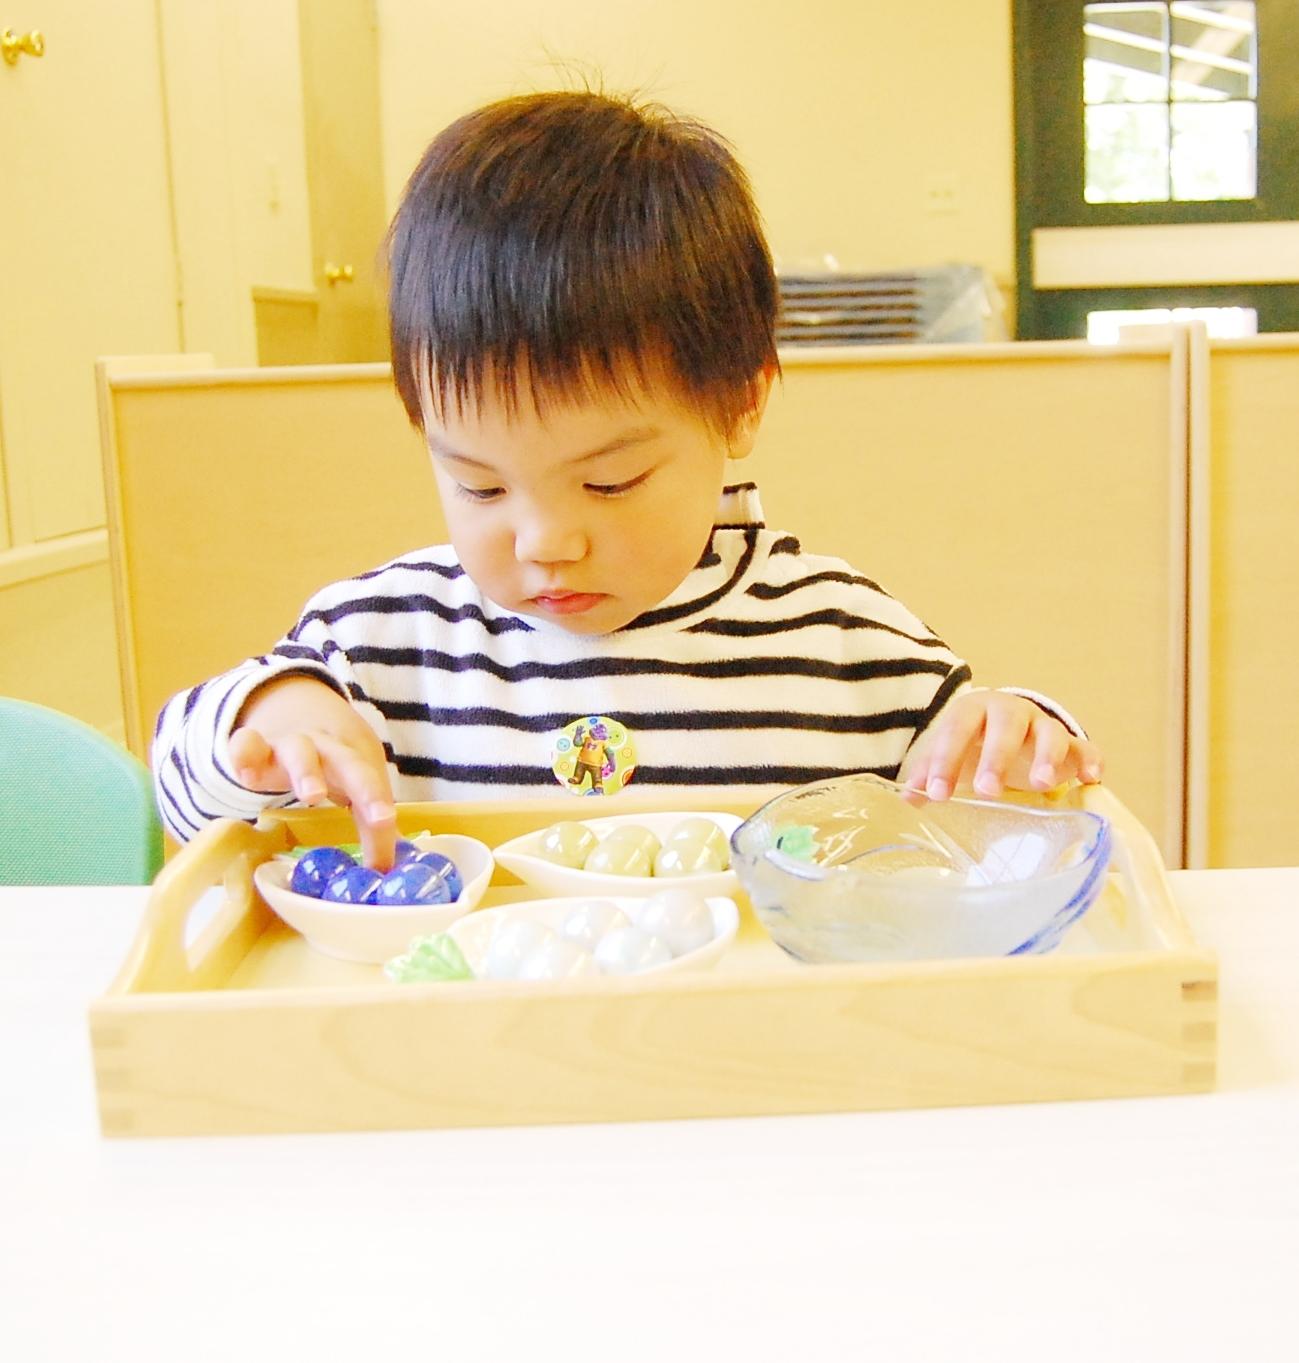 cupertino_preschool_one_child.jpg